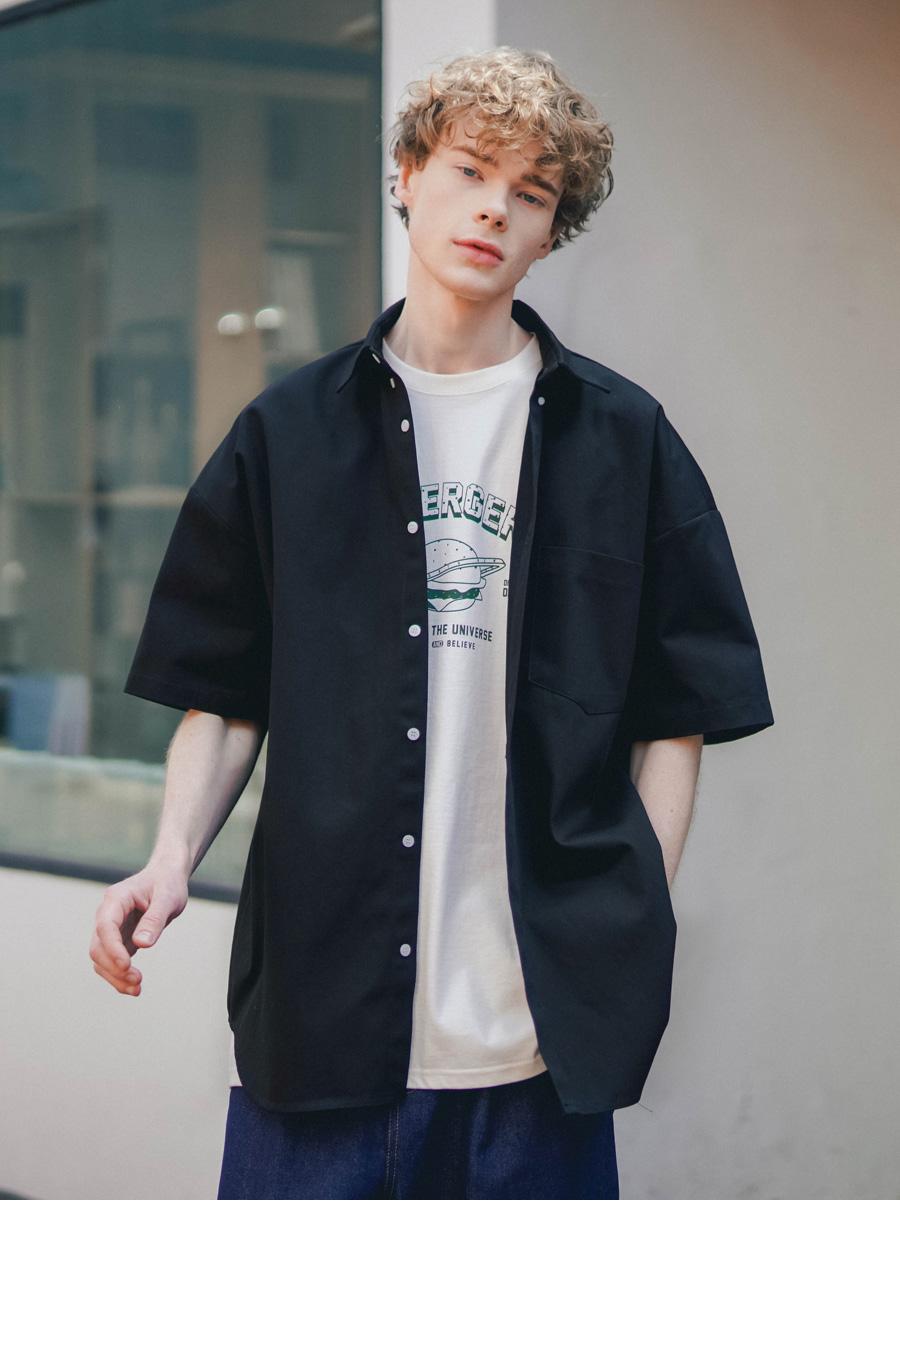 20210331_twn_bedy_shirt_model_je_07.jpg